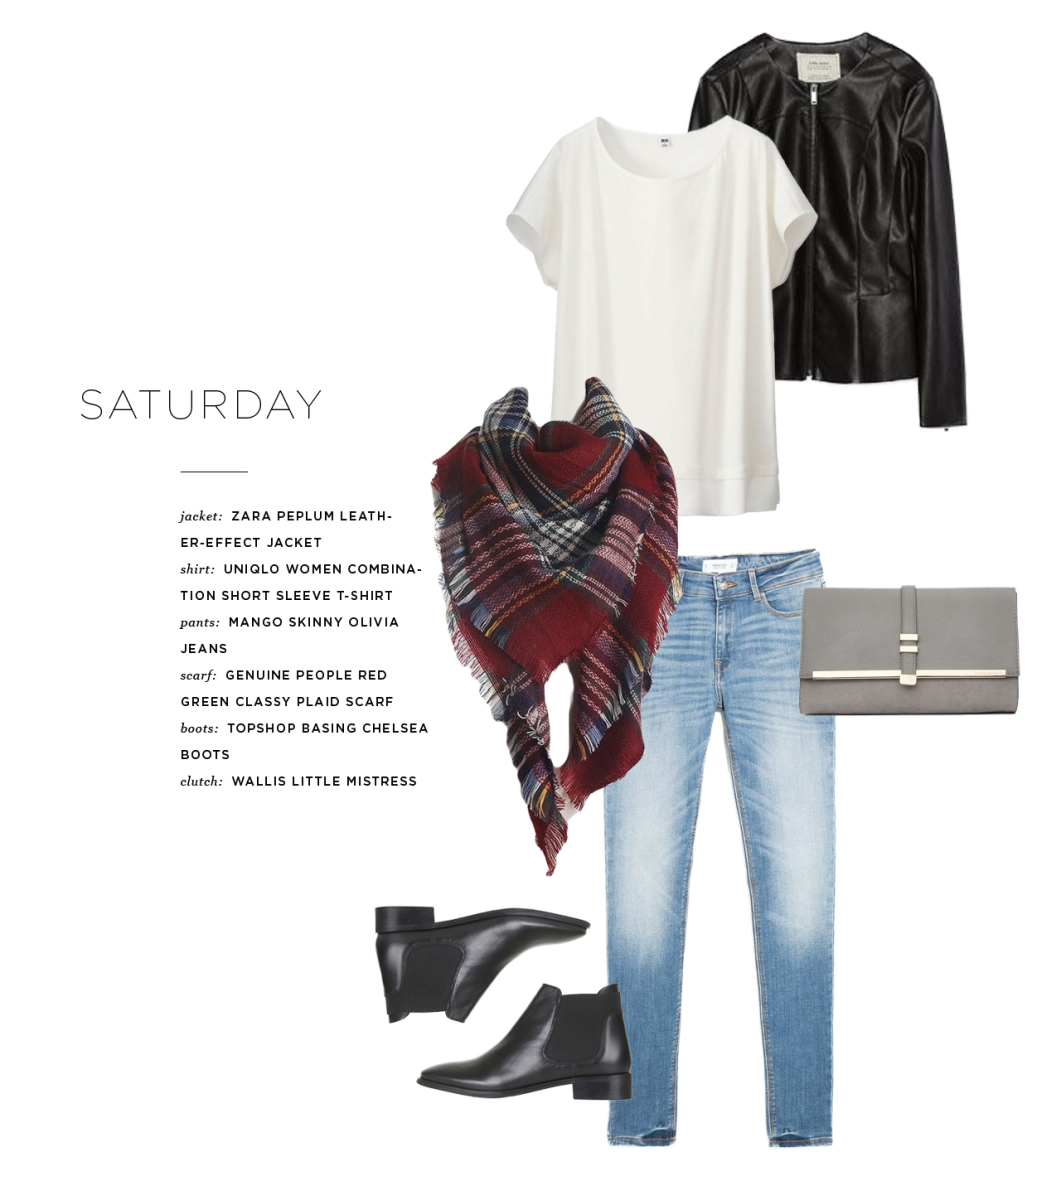 Jacket: Zara, $70 / Shirt: Uniqlo, $10 (similar) / Pants: Mango, $60/ Scarf: Genuine People, $24 / Clutch: Wallis, $35/ Boots: Topshop, $65